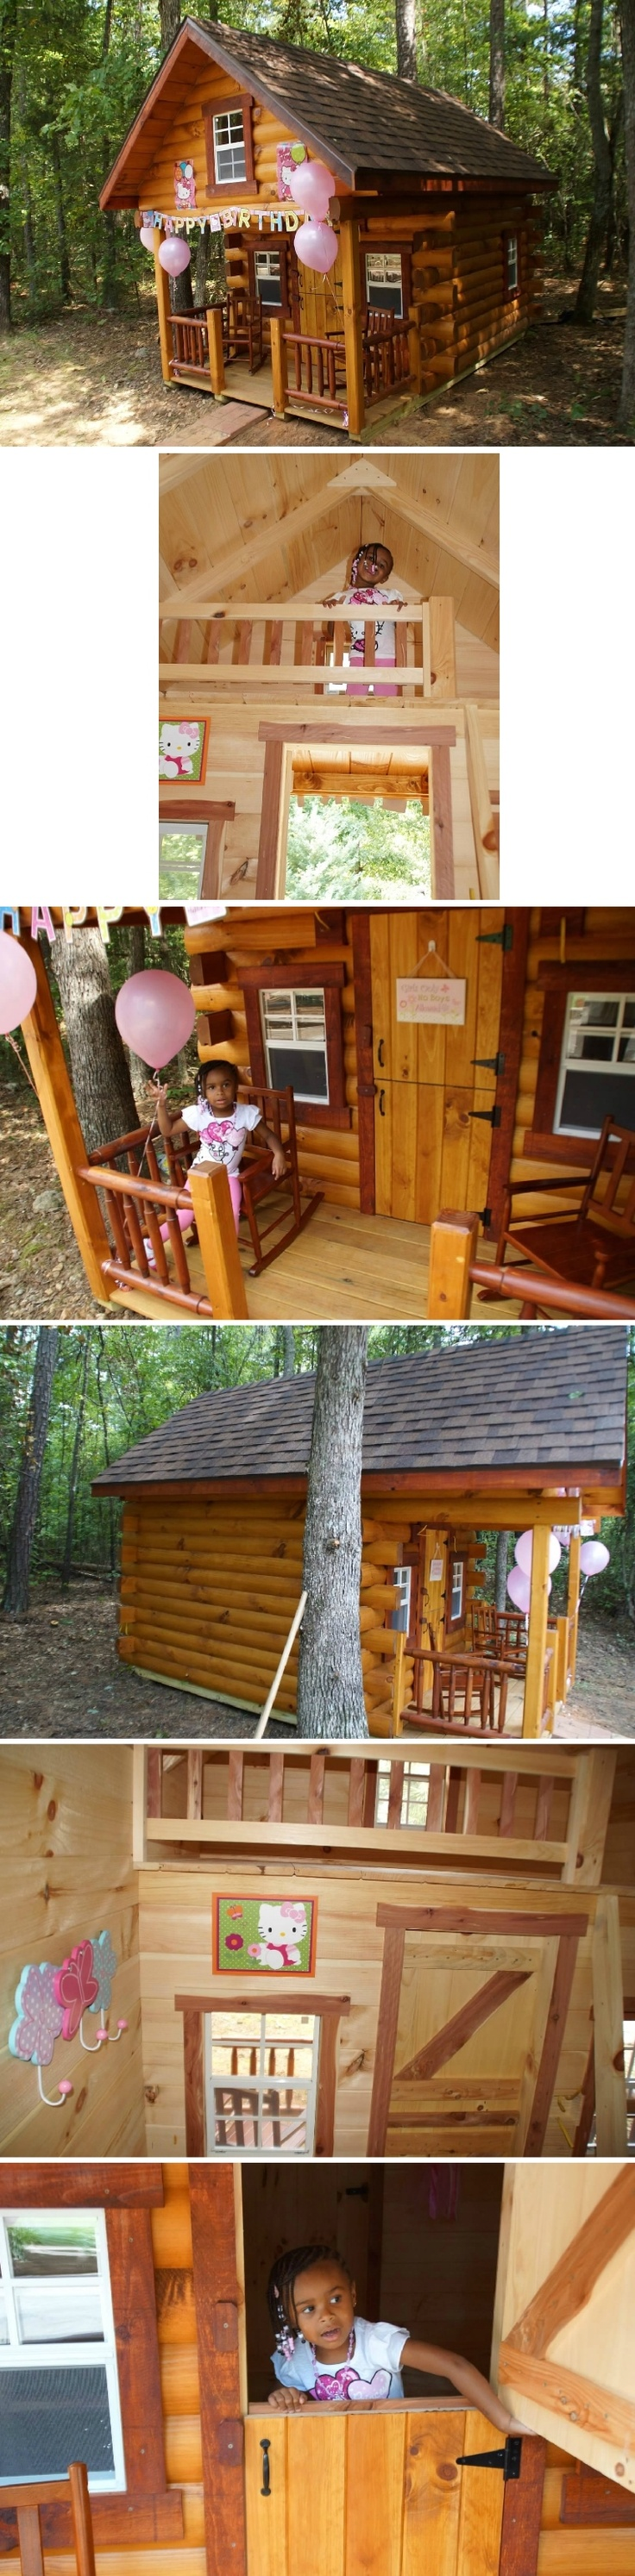 Surprise birthday playhouse cabin!